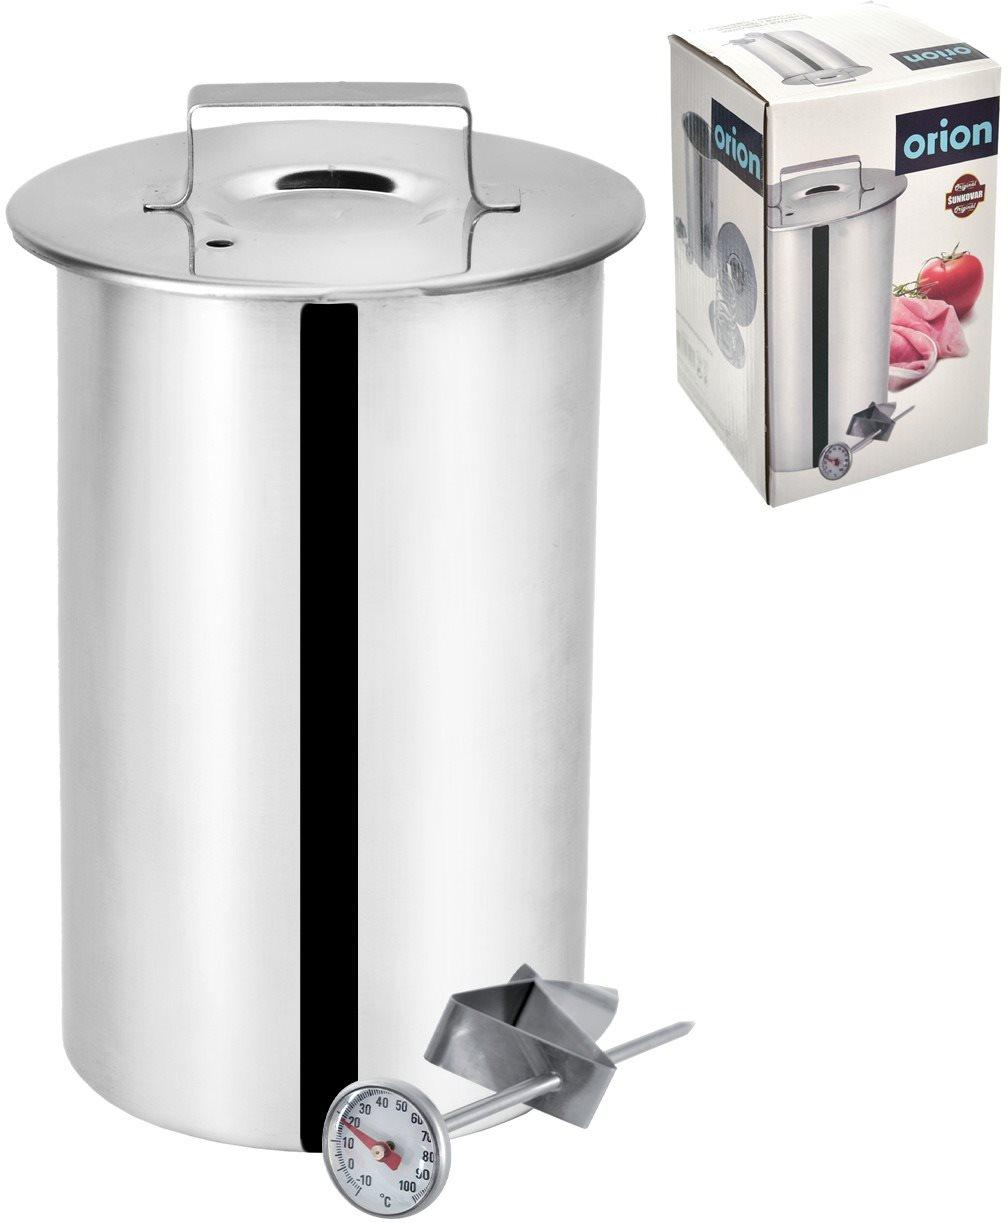 ORION Rozsdamentes acél kalapács 10 cm-es hőmérővel